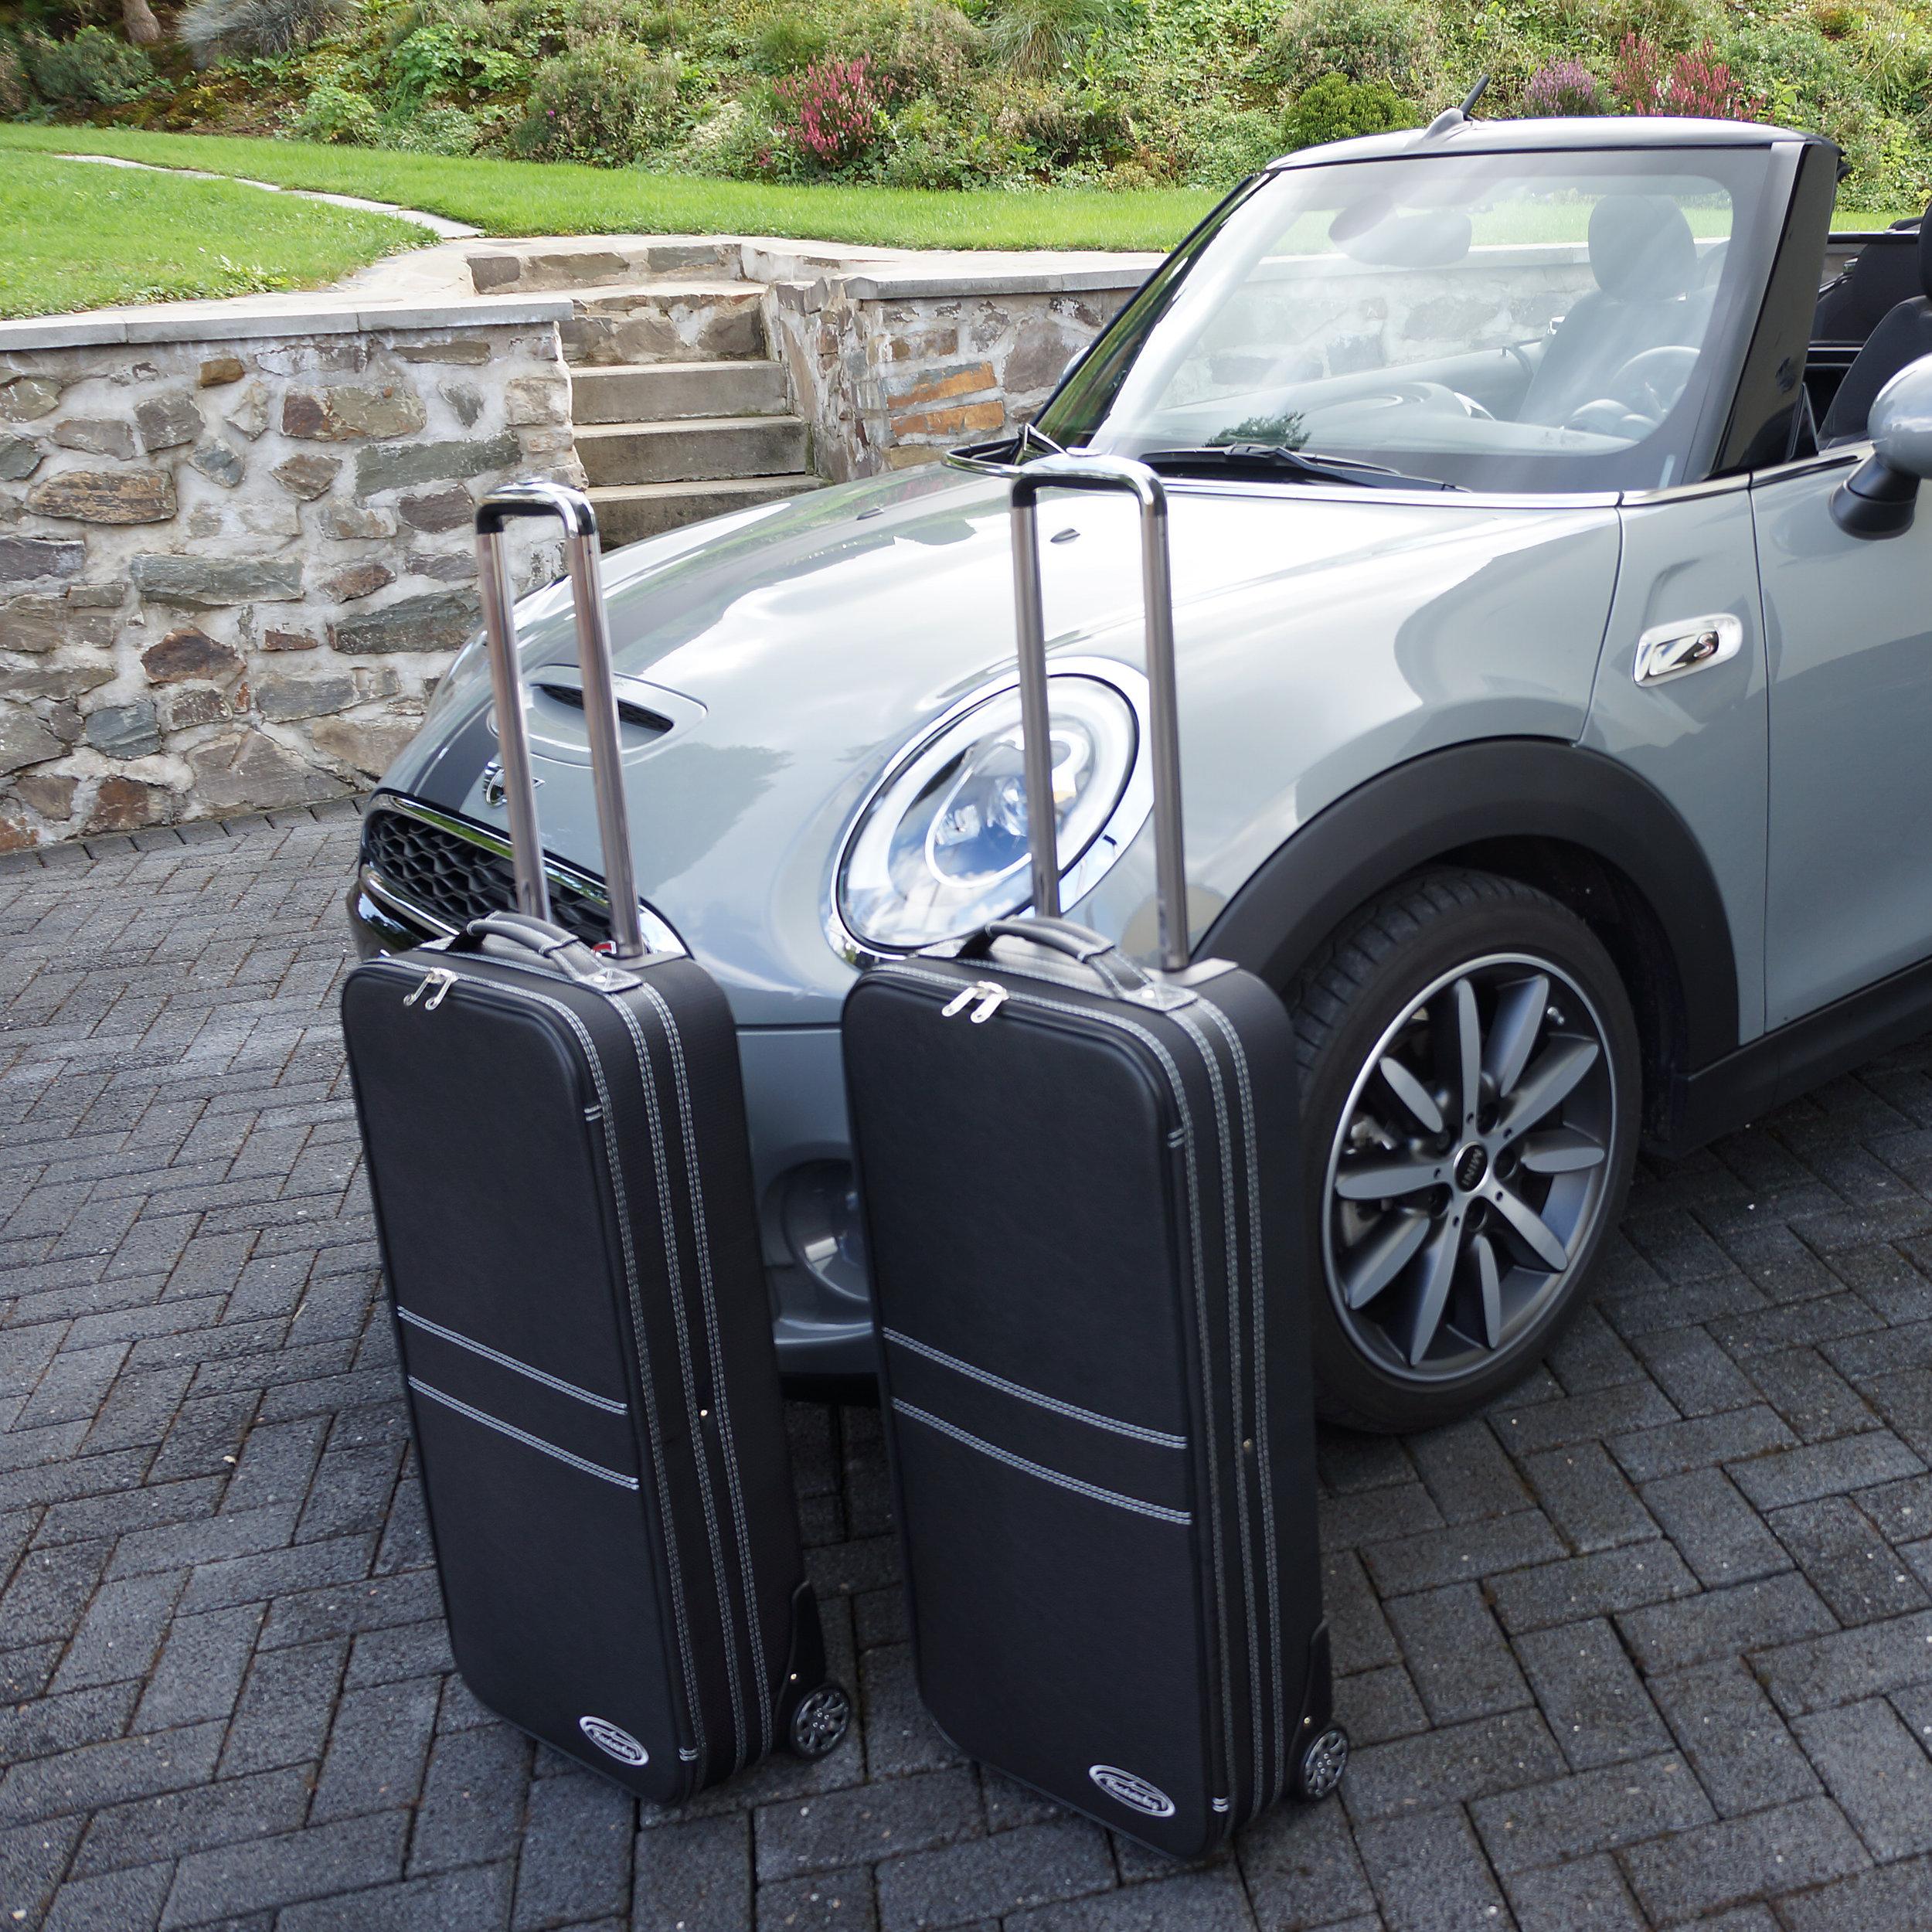 2-part Luggage Set with 2 wheels Mini Cabrio (F57) XXL